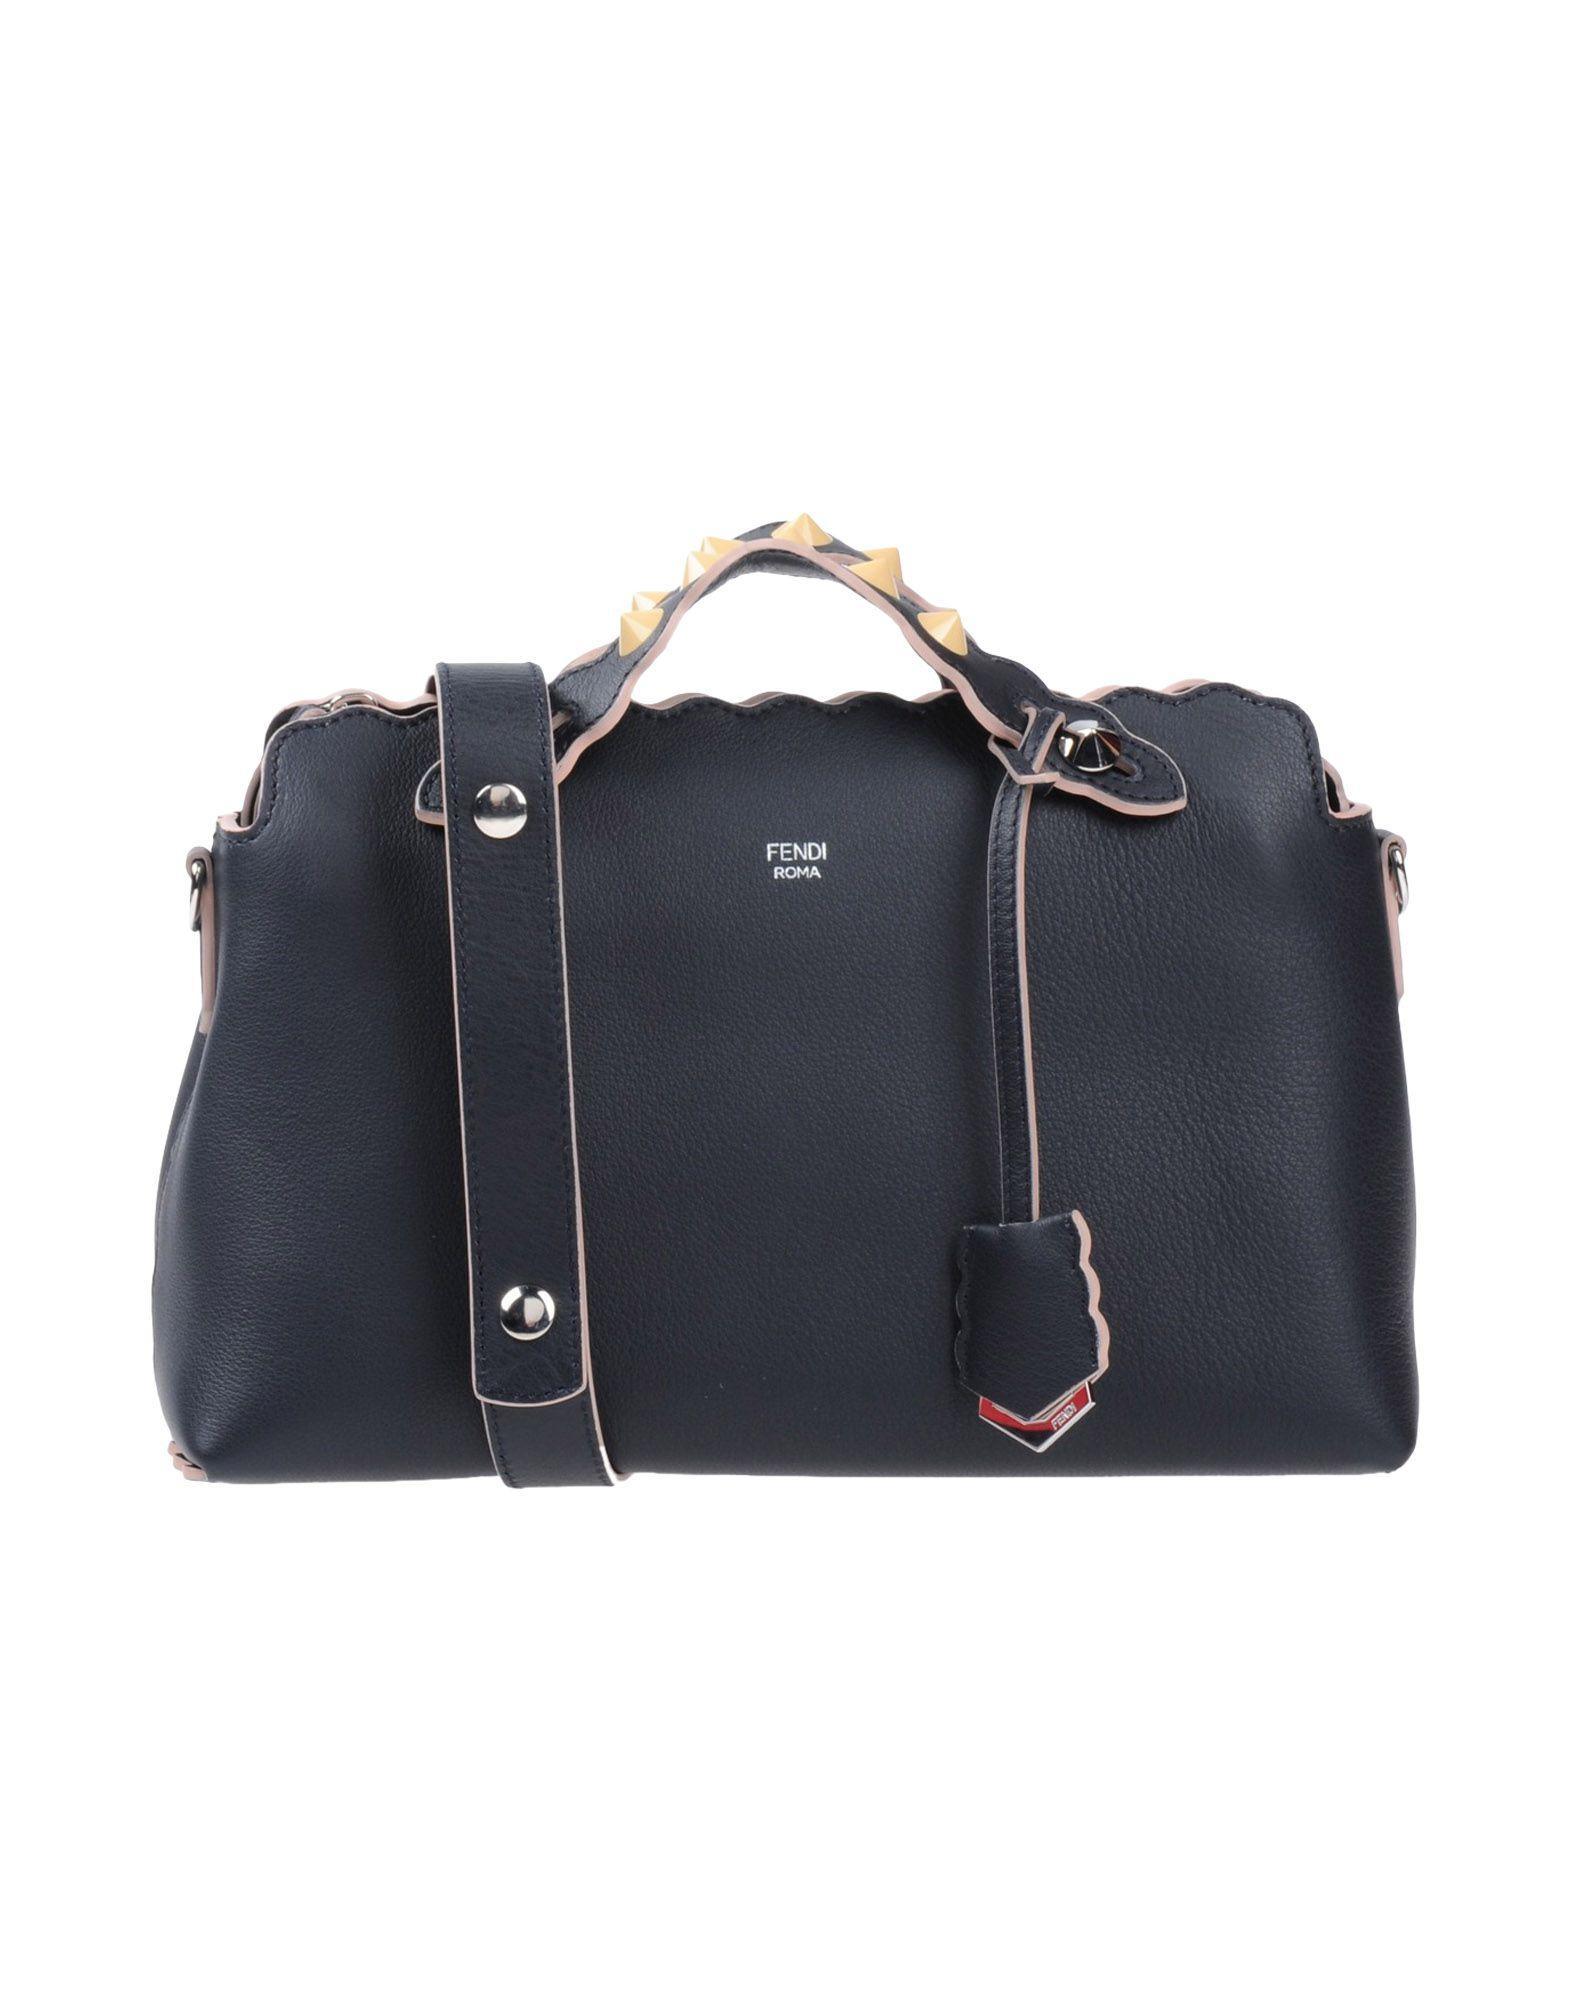 Fendi Handbag In Black